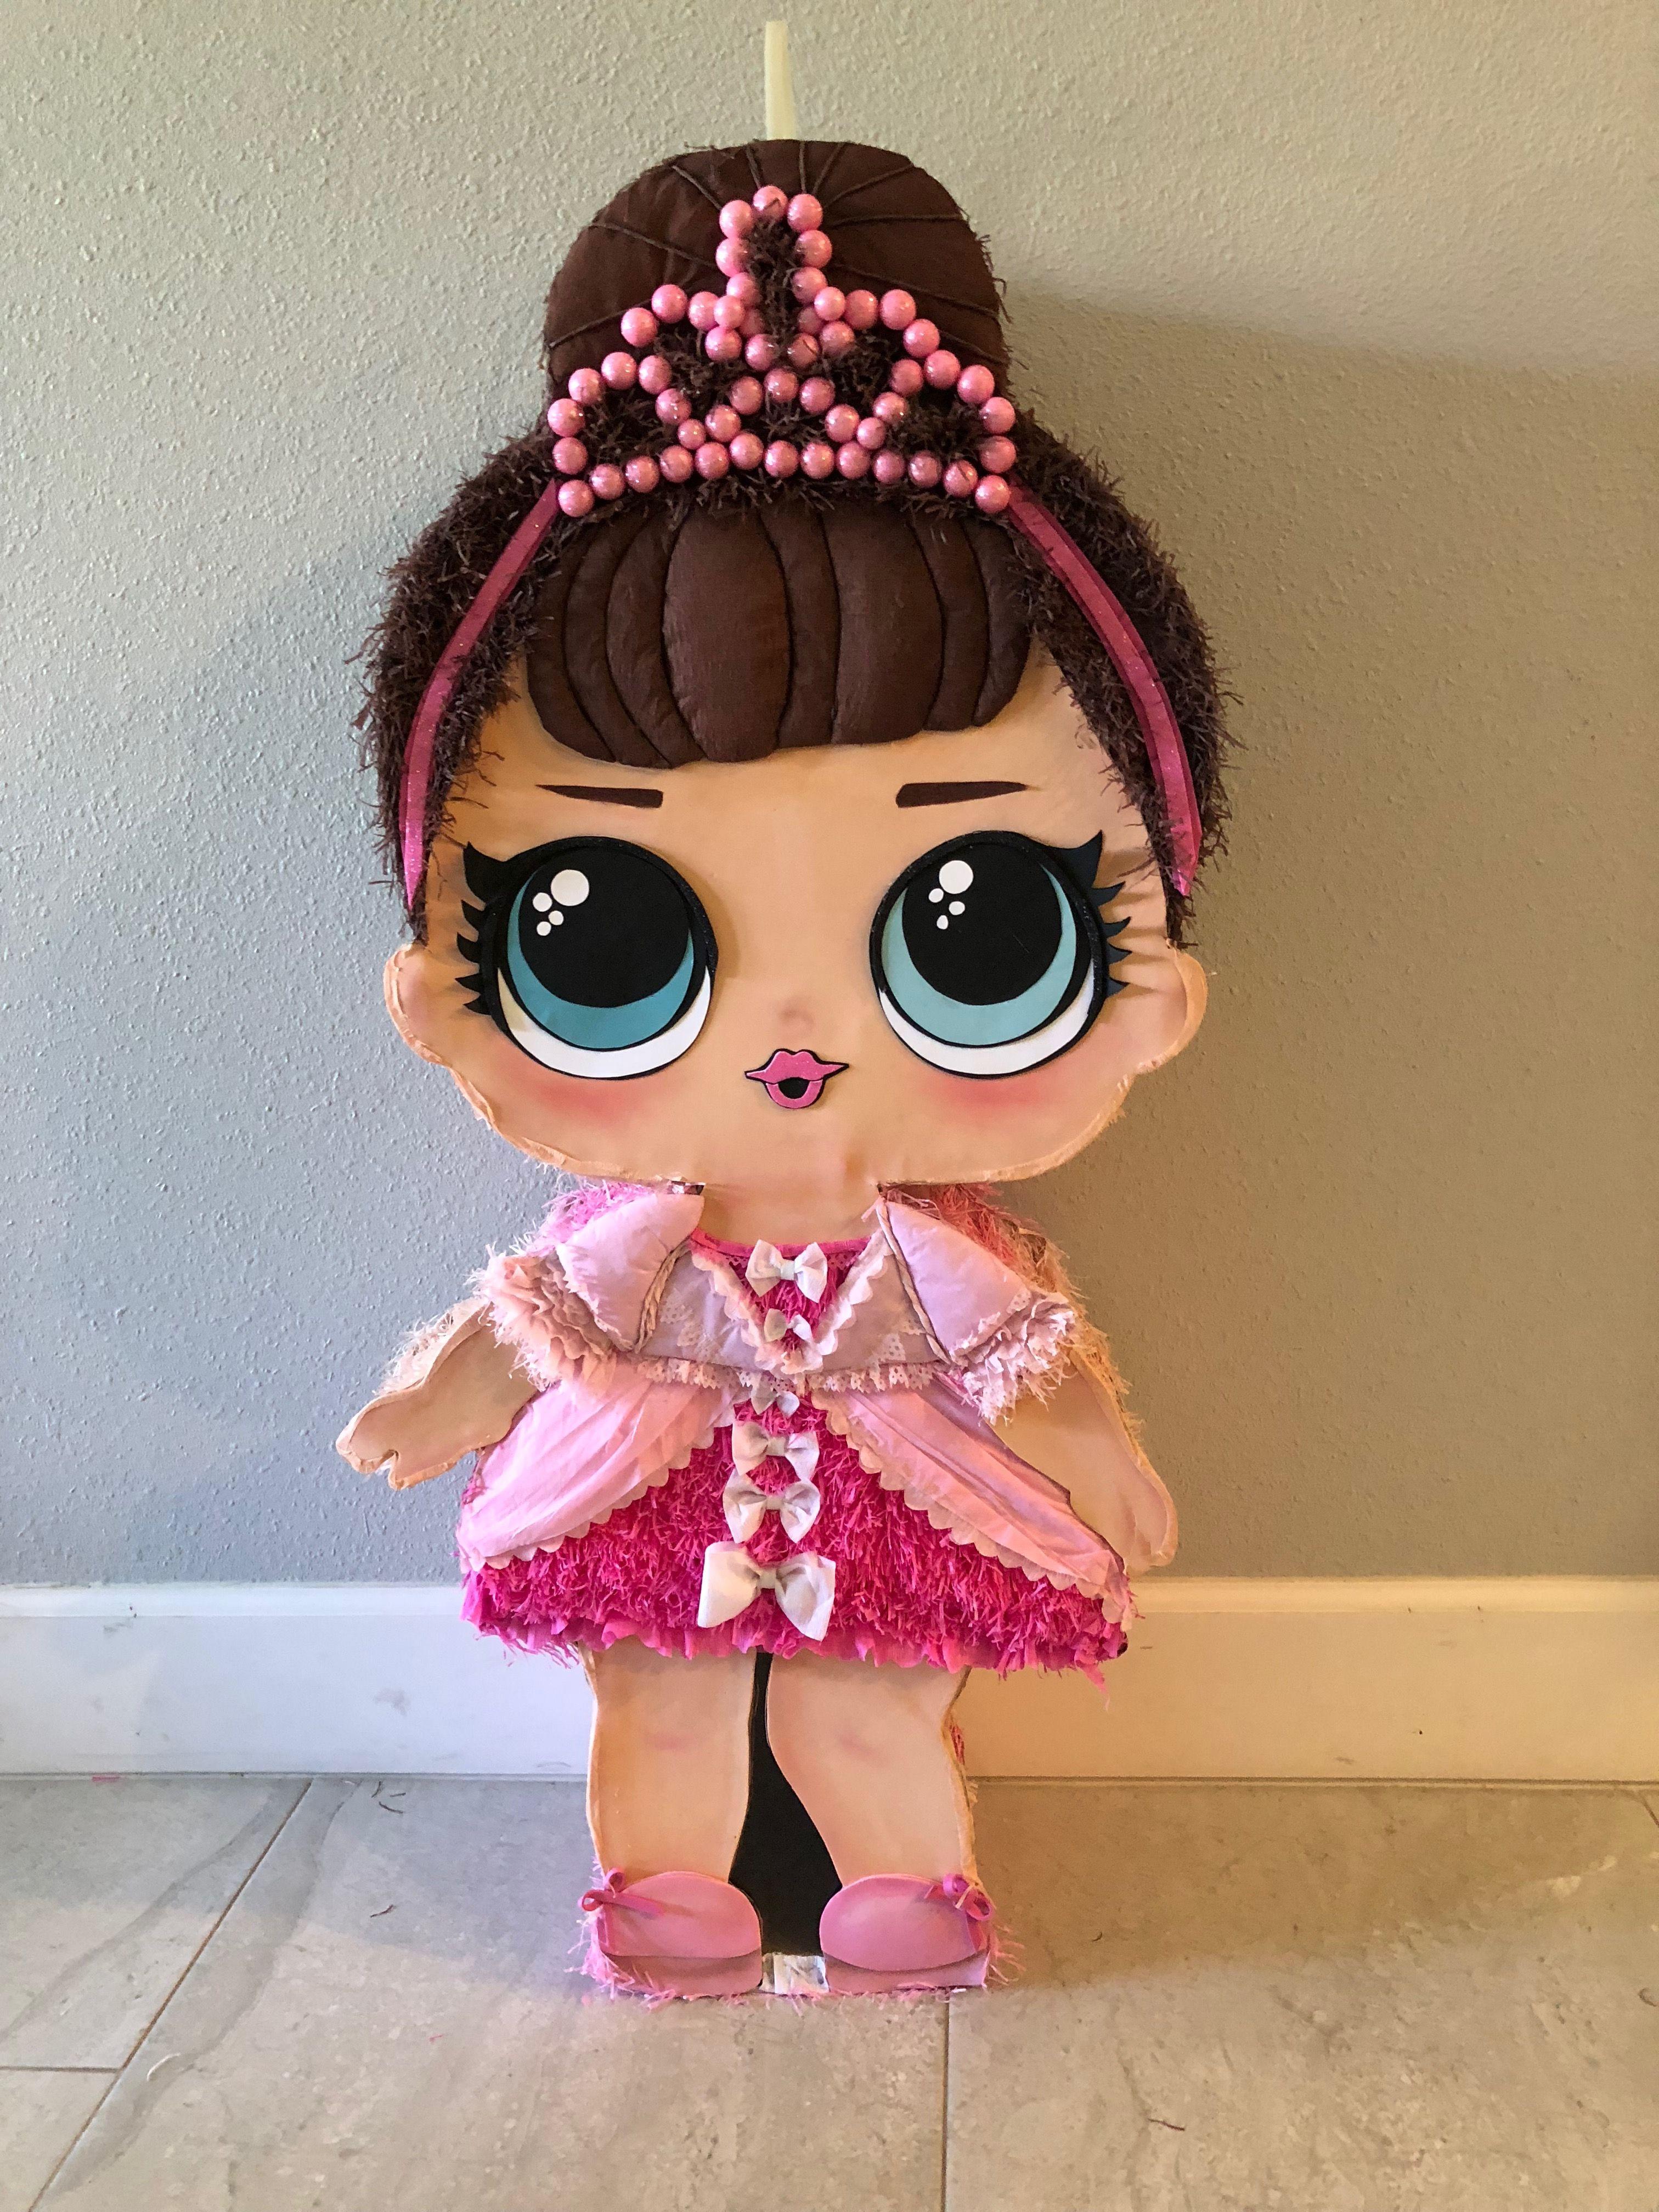 e5c94689e Piñatas~LOL doll Piñata | Muñecas LOL en 2019 | Fiesta de muñecas ...